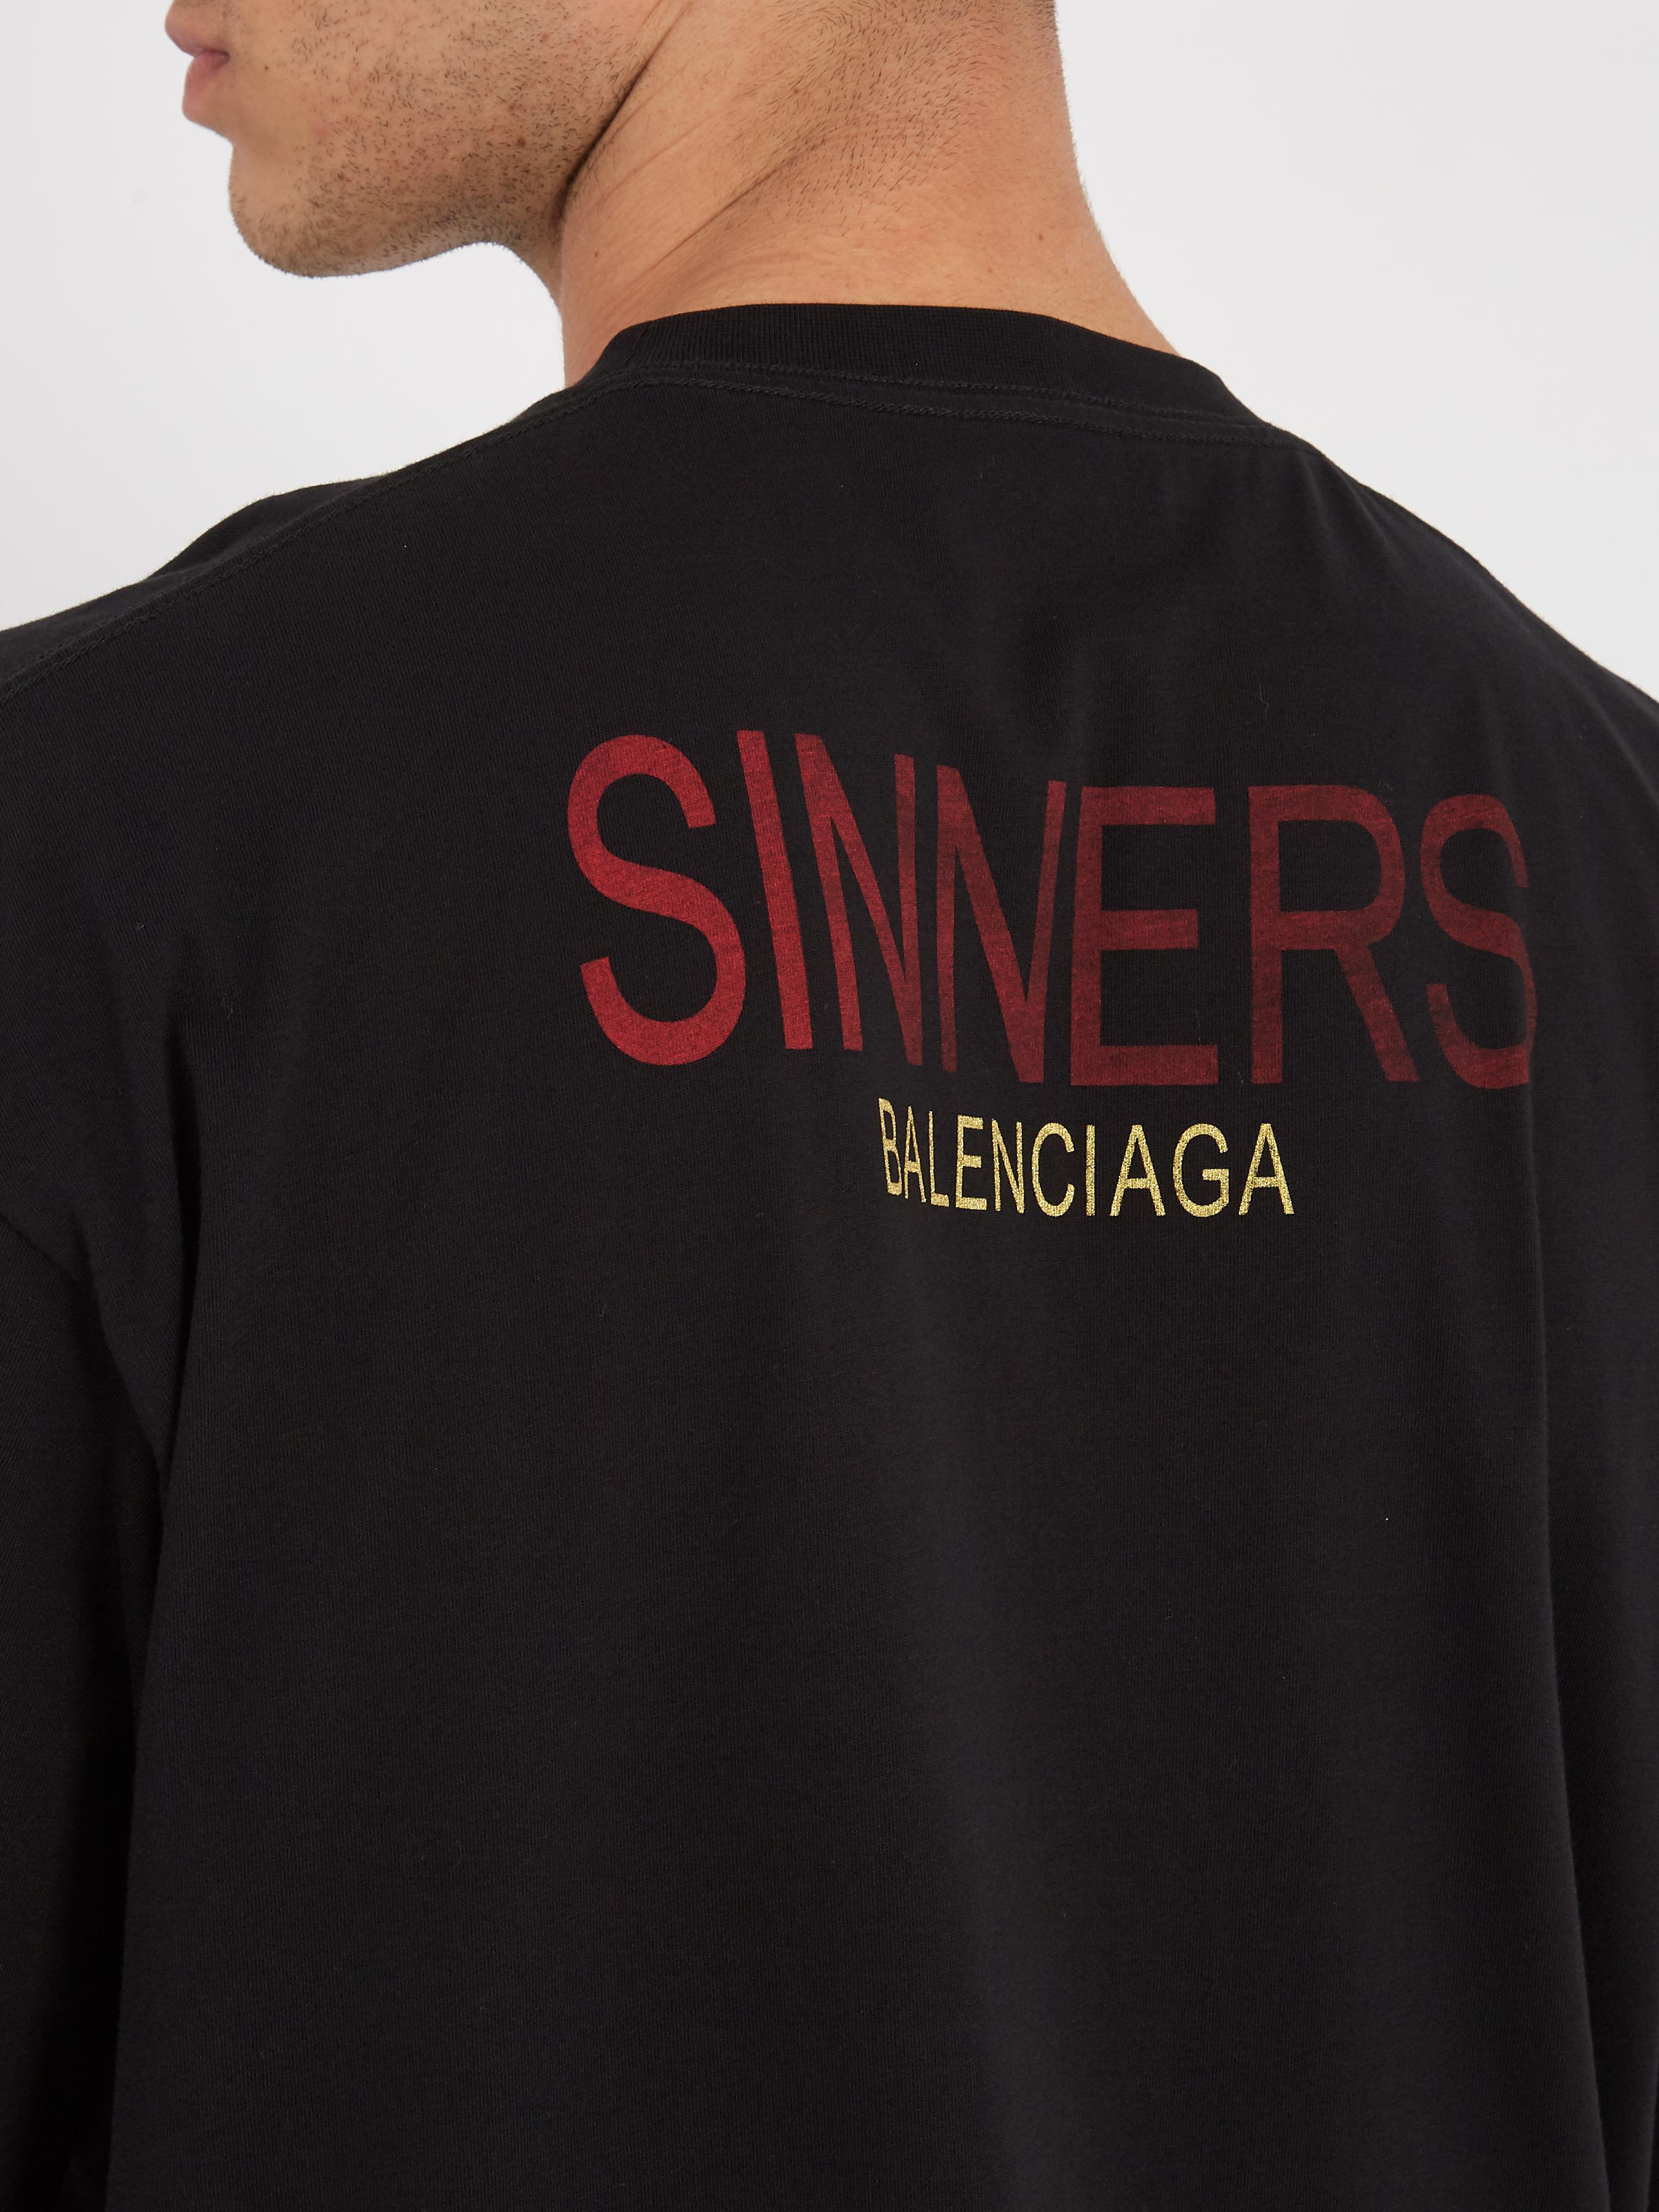 a28579da1eb5 Balenciaga Oversized Sinners-print Cotton T-shirt in Black for Men ...